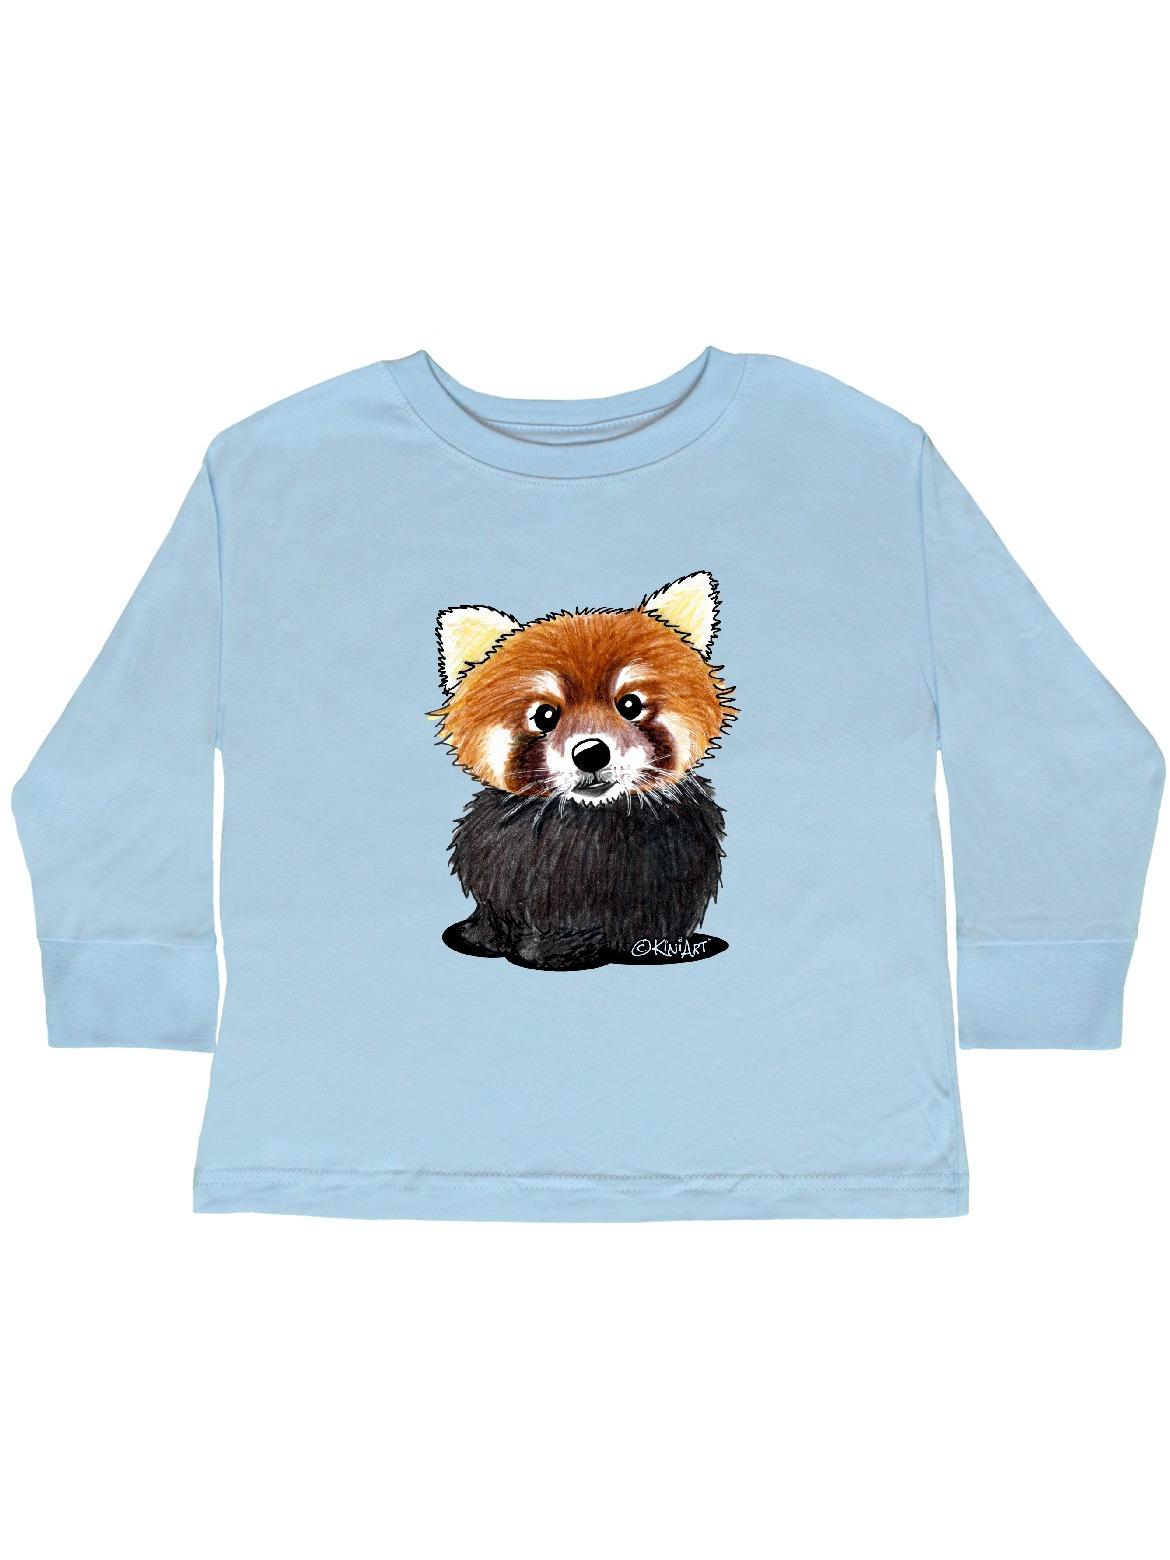 KiniArt Red Panda Toddler Long Sleeve T-Shirt - KiniArt